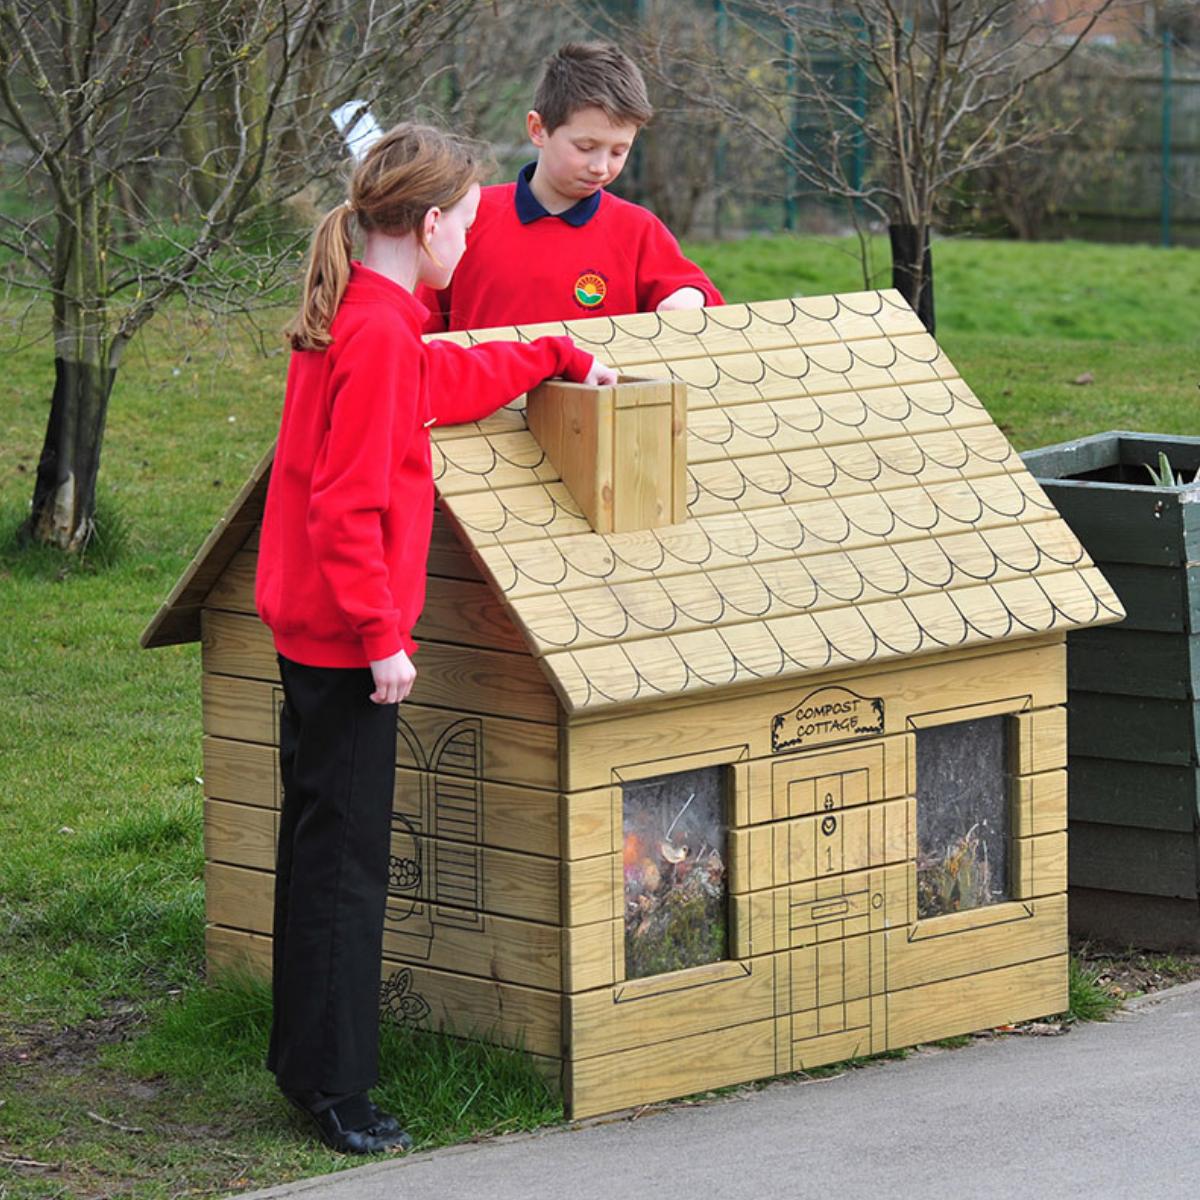 Compost Cottage